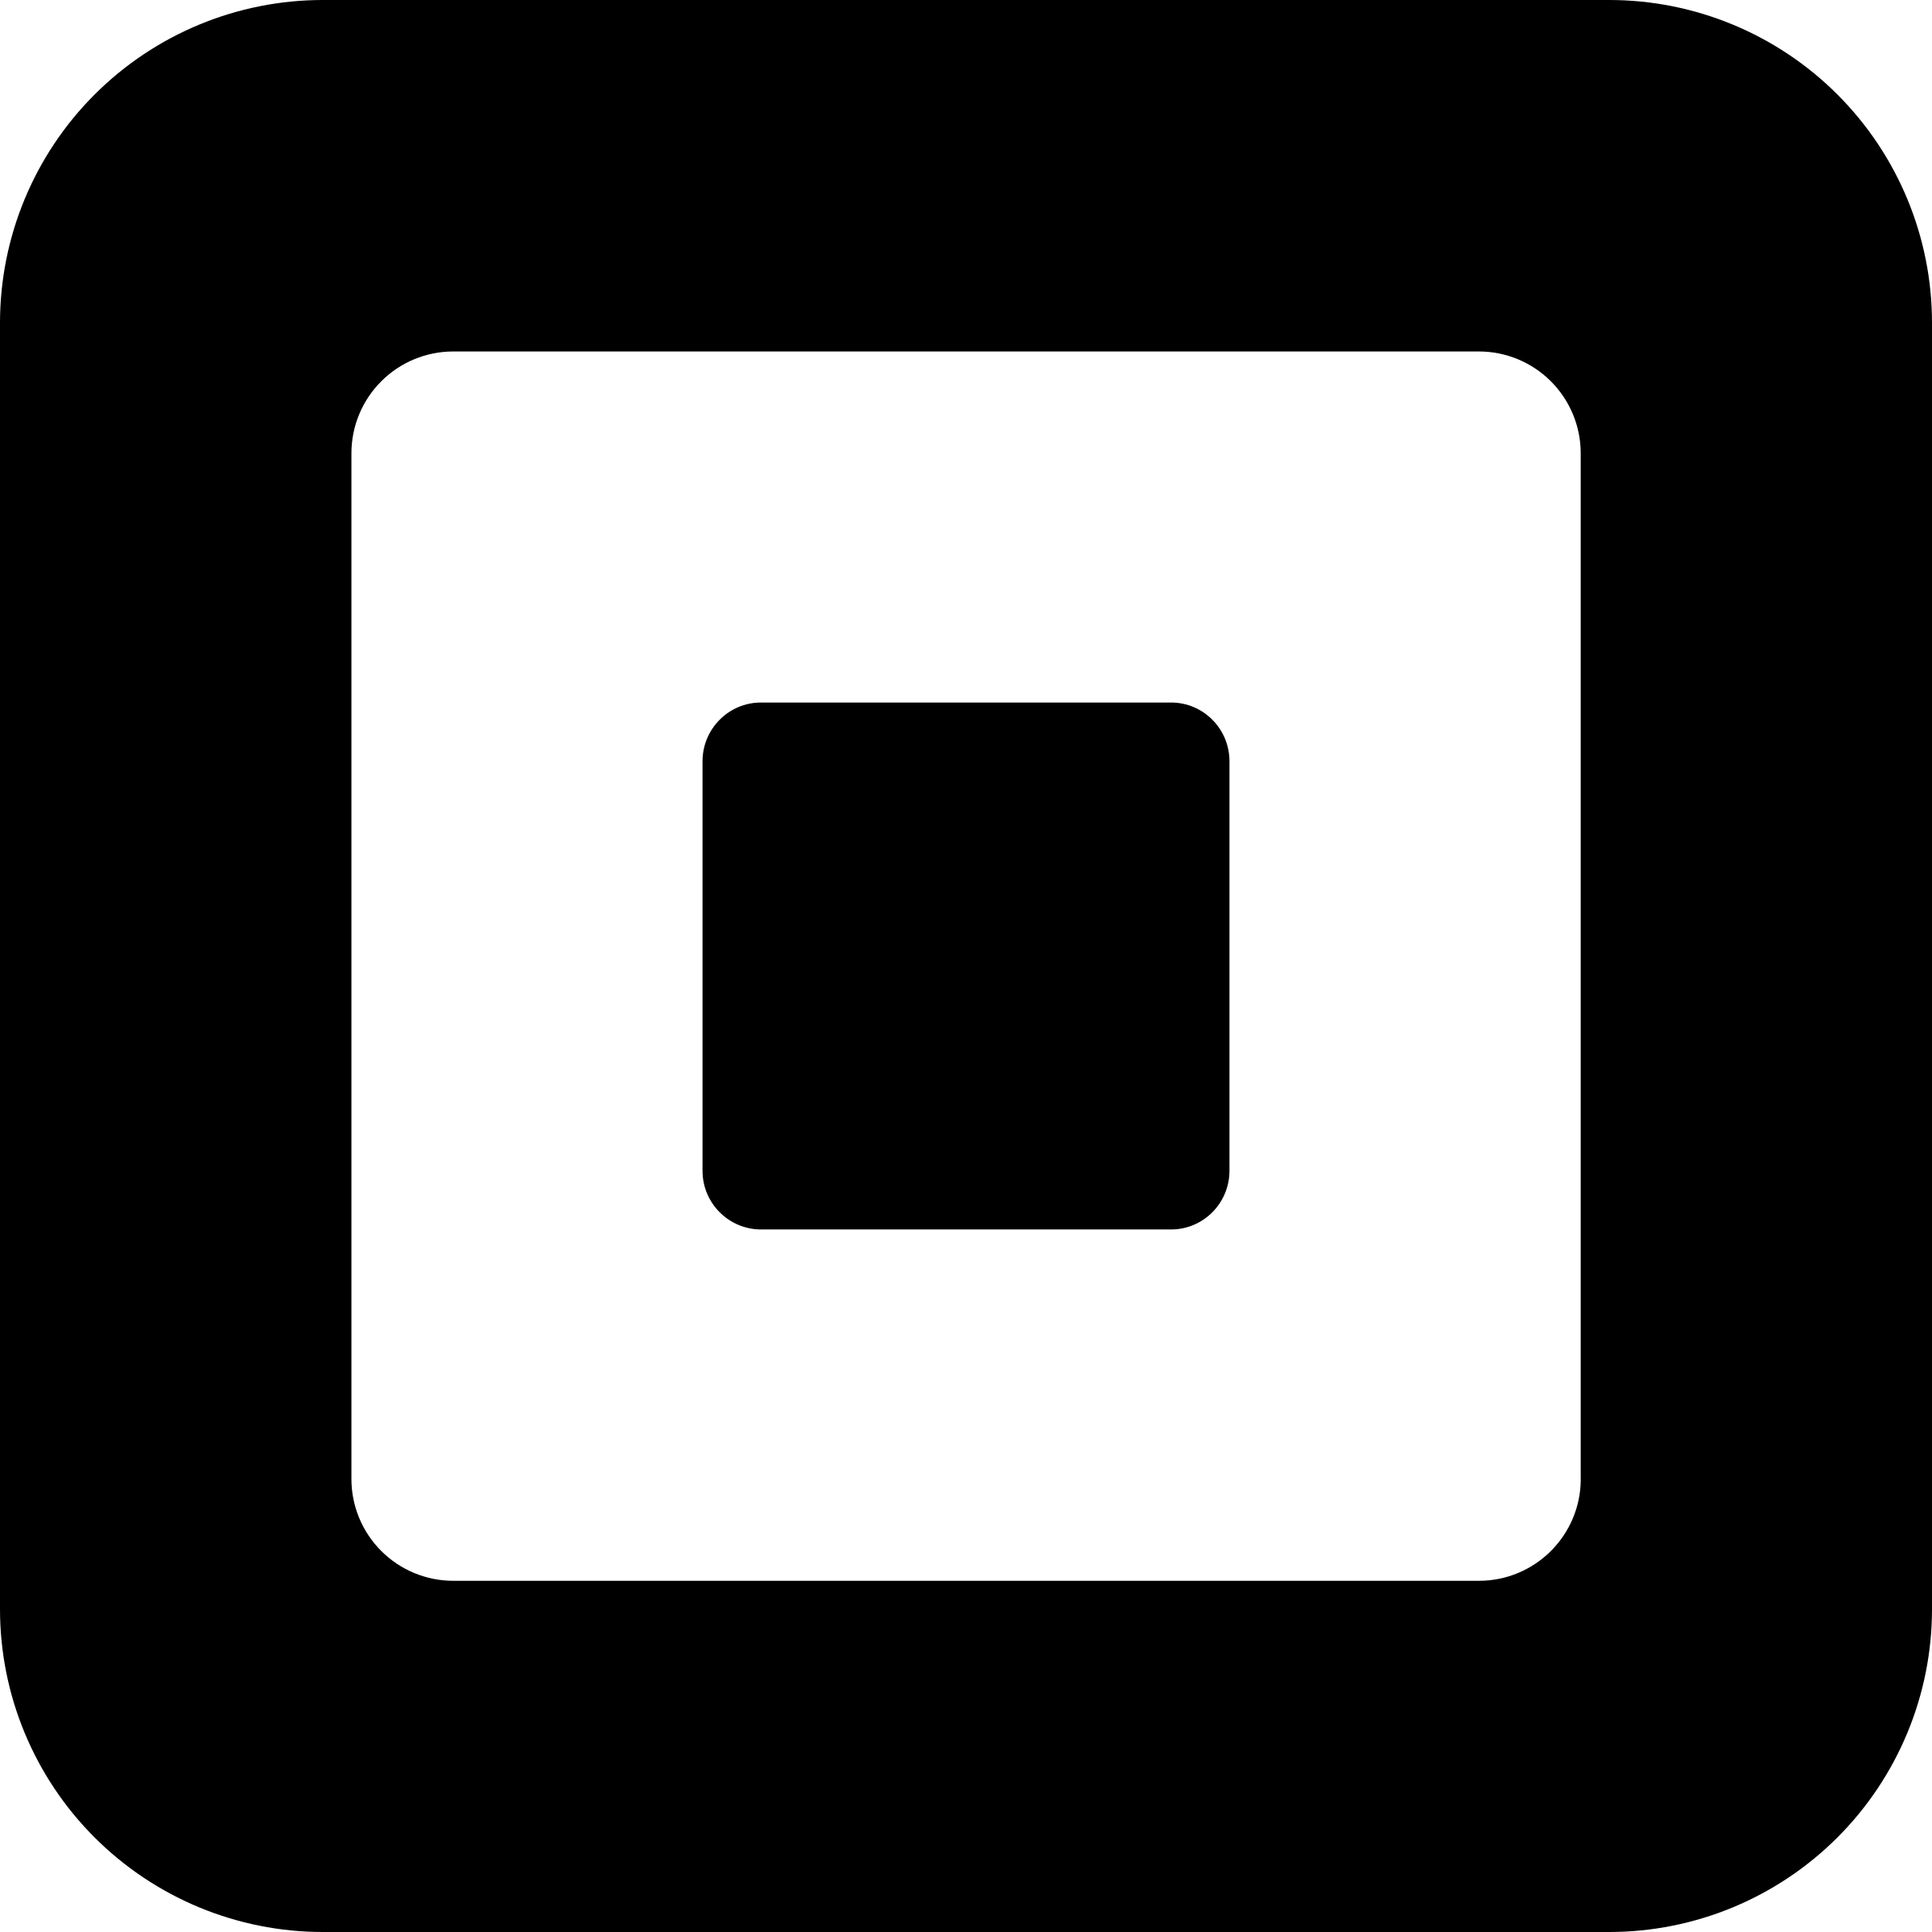 Square Logo PNG Transparent & SVG Vector - Freebie Supply